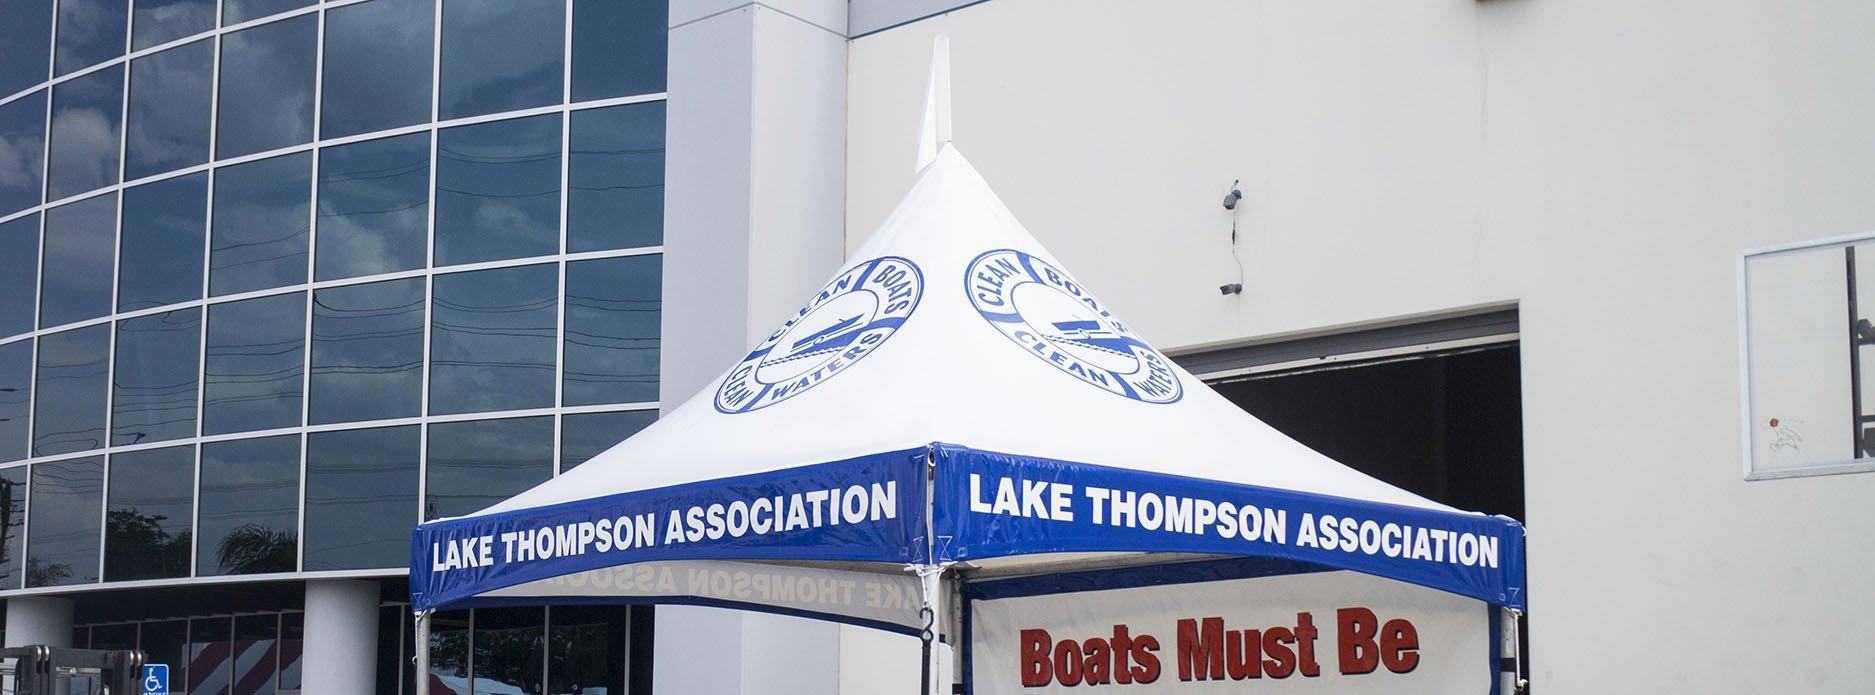 lake-thomson-association-header.jpg